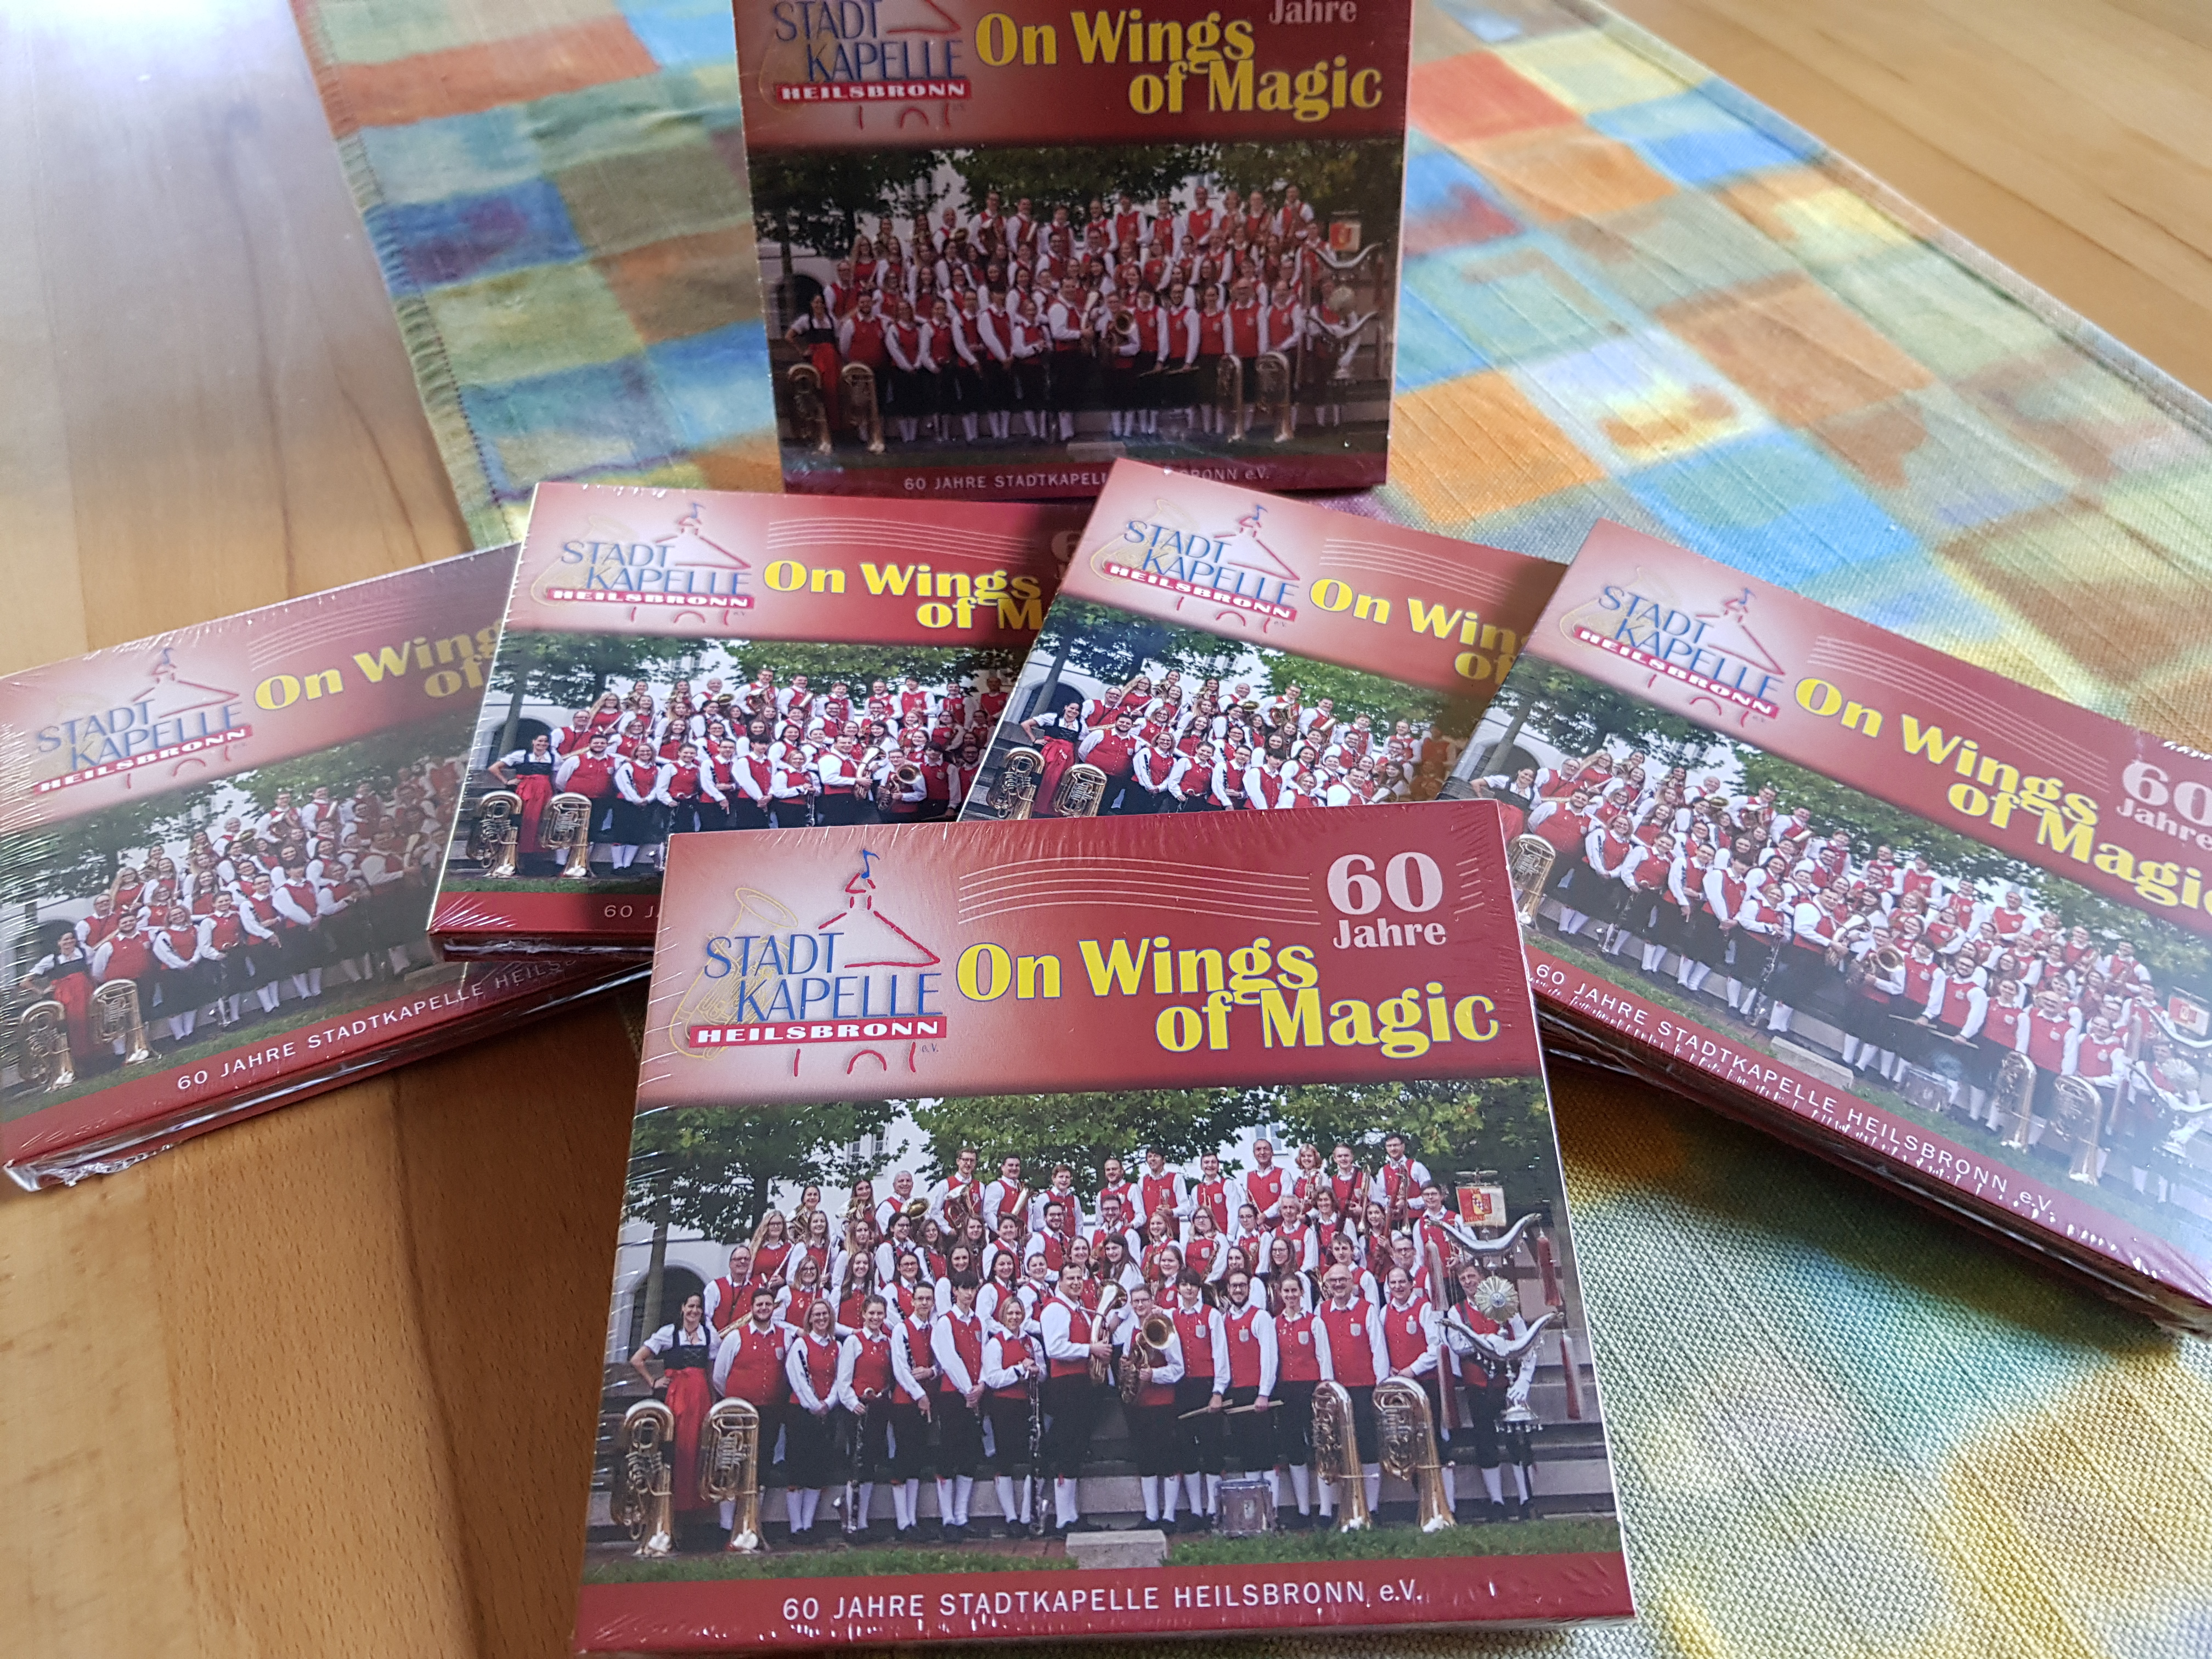 Unsere CD ist da!